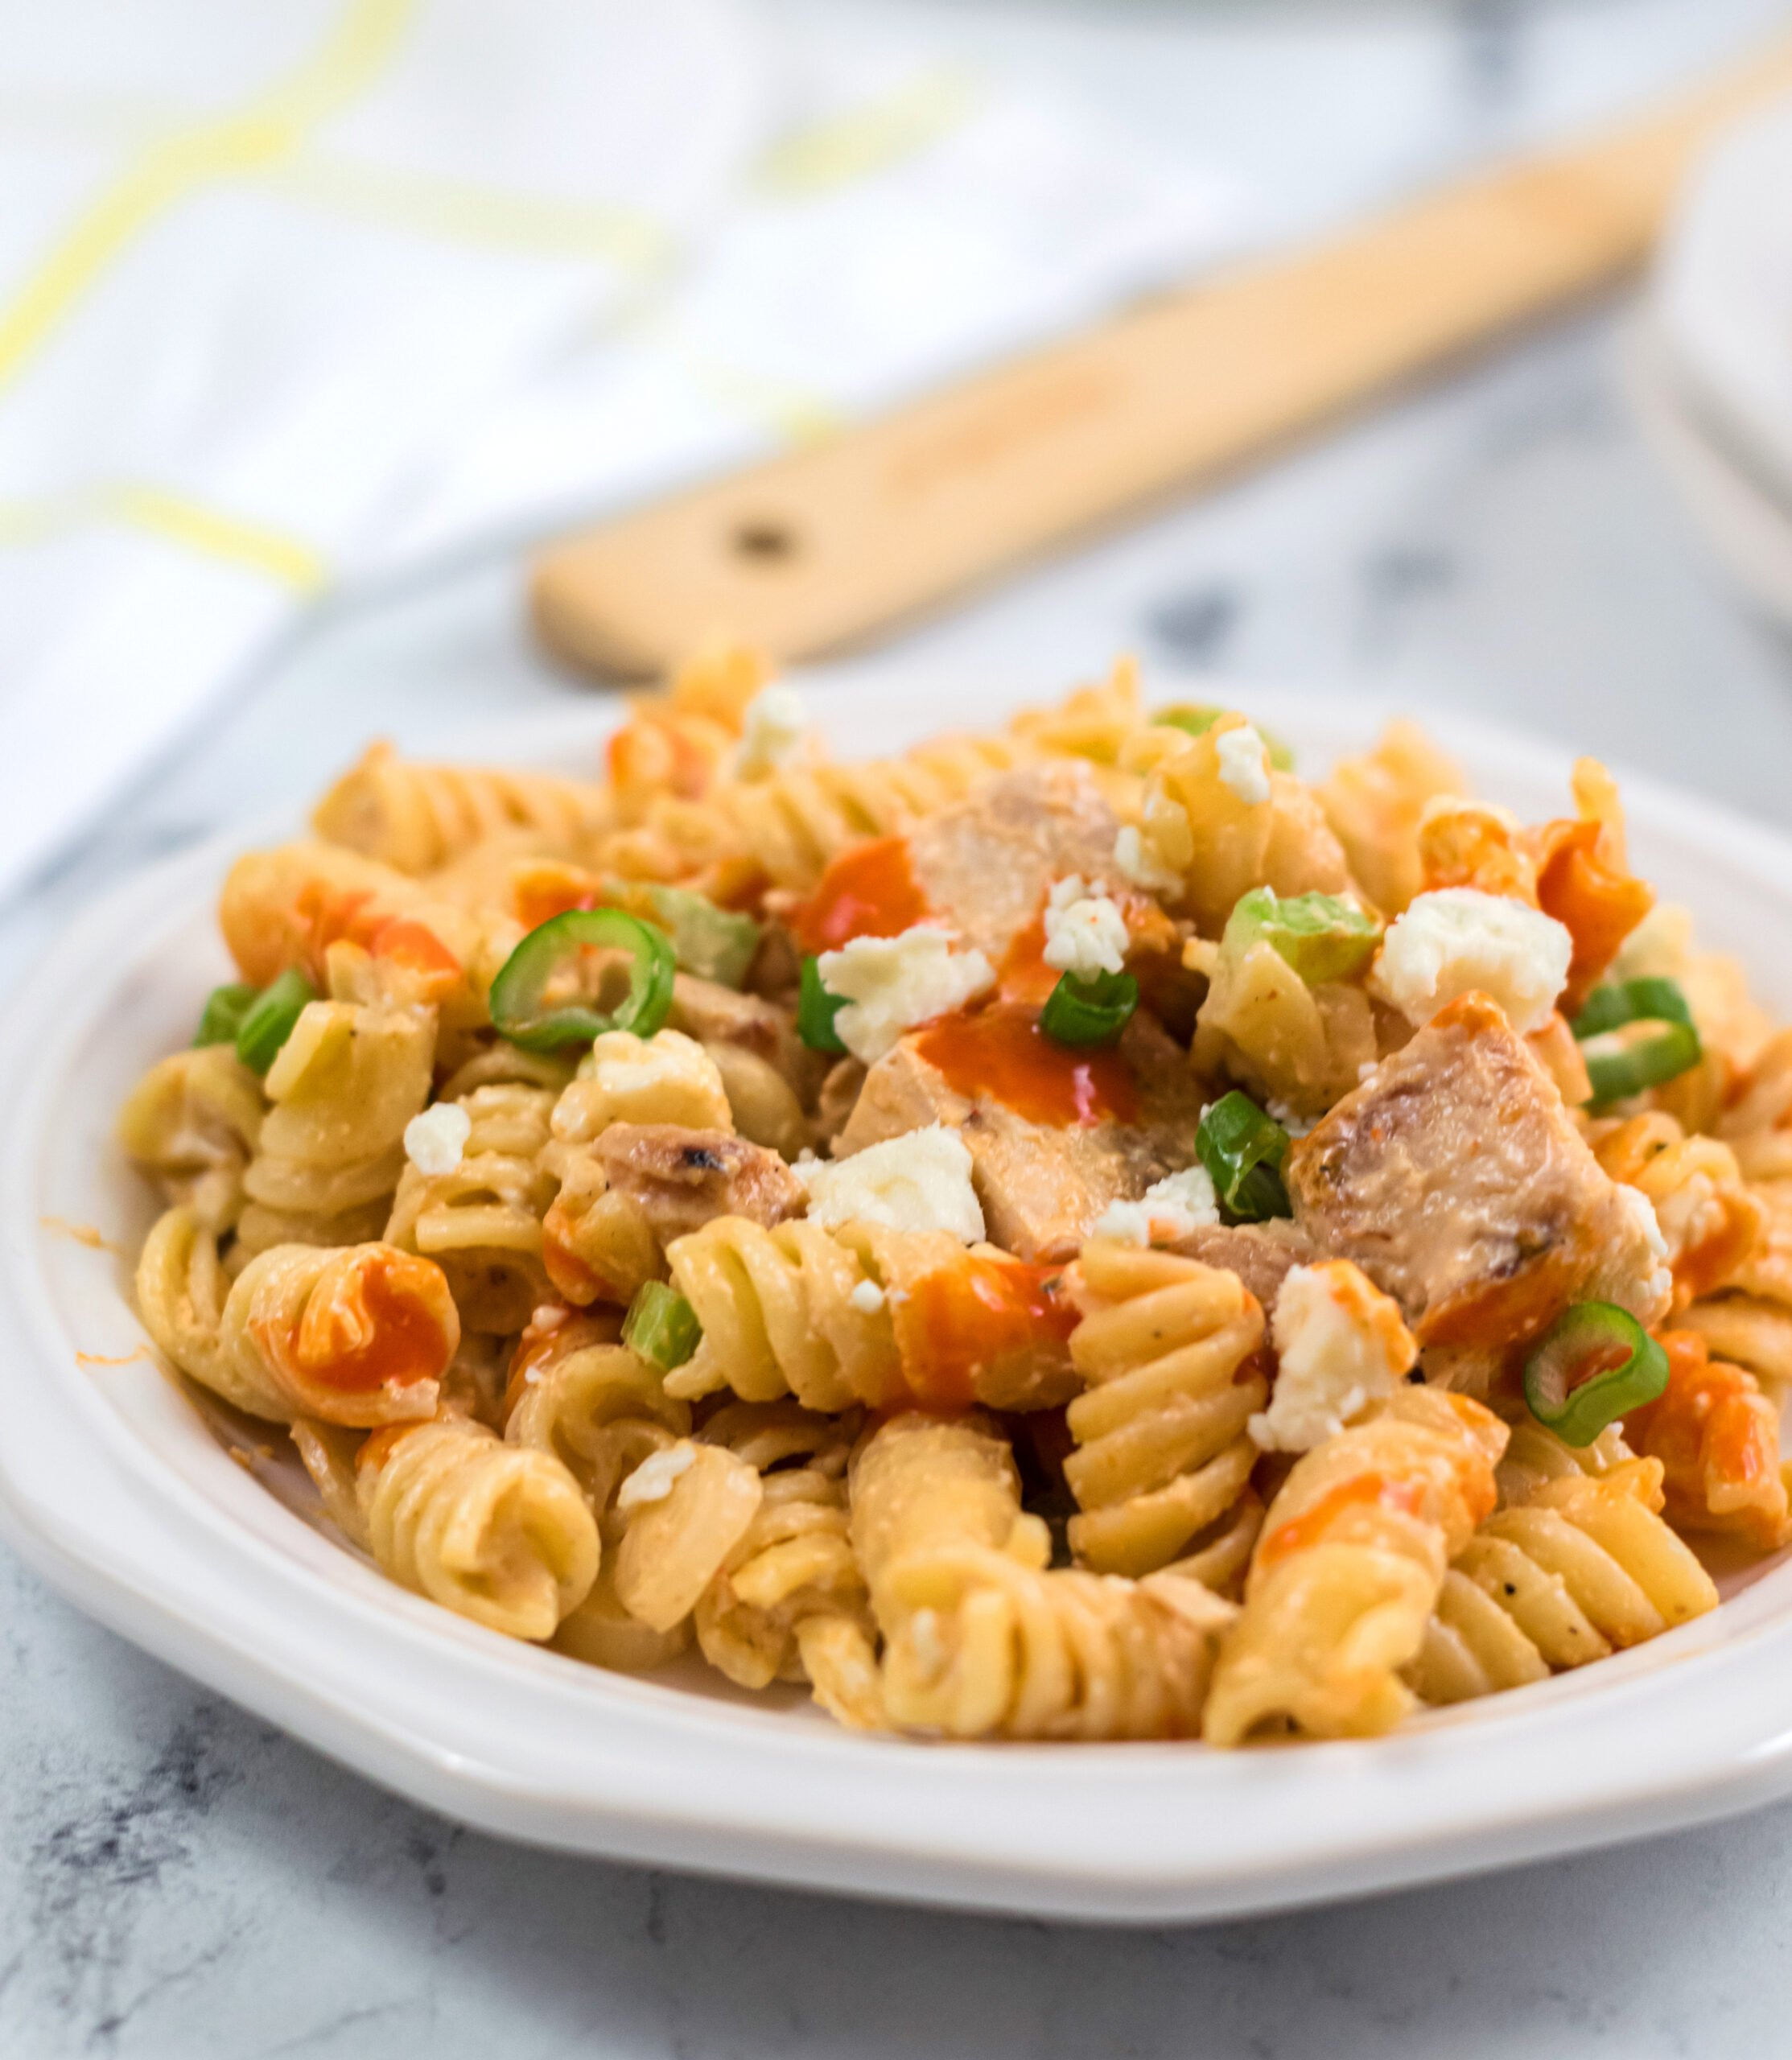 A plate full of creamy buffalo chicken pasta salad